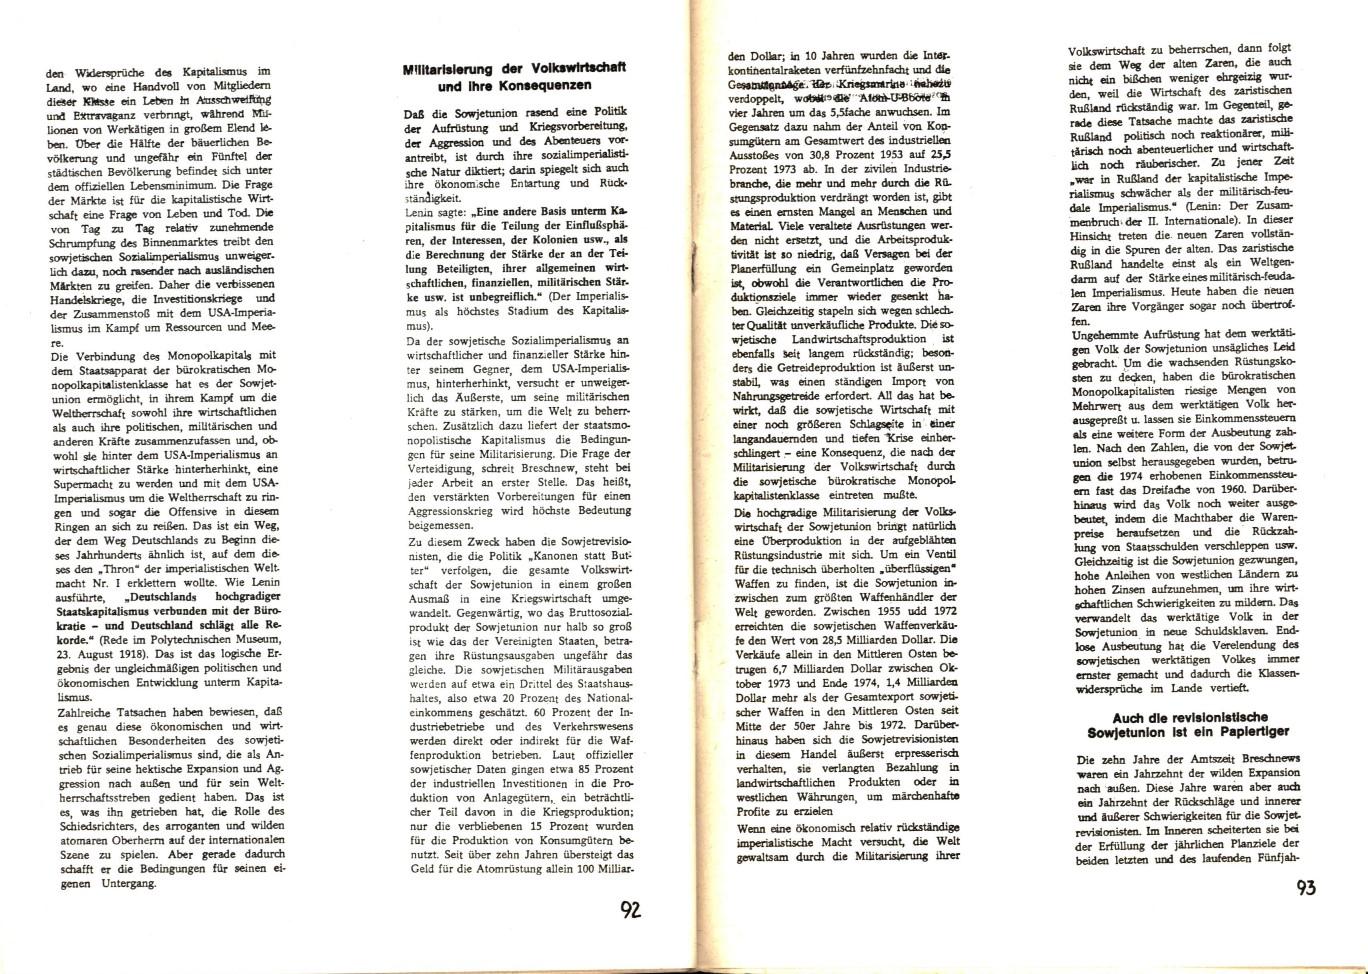 Berlin_KSV_1975_Dokumente_der_SAZ_48